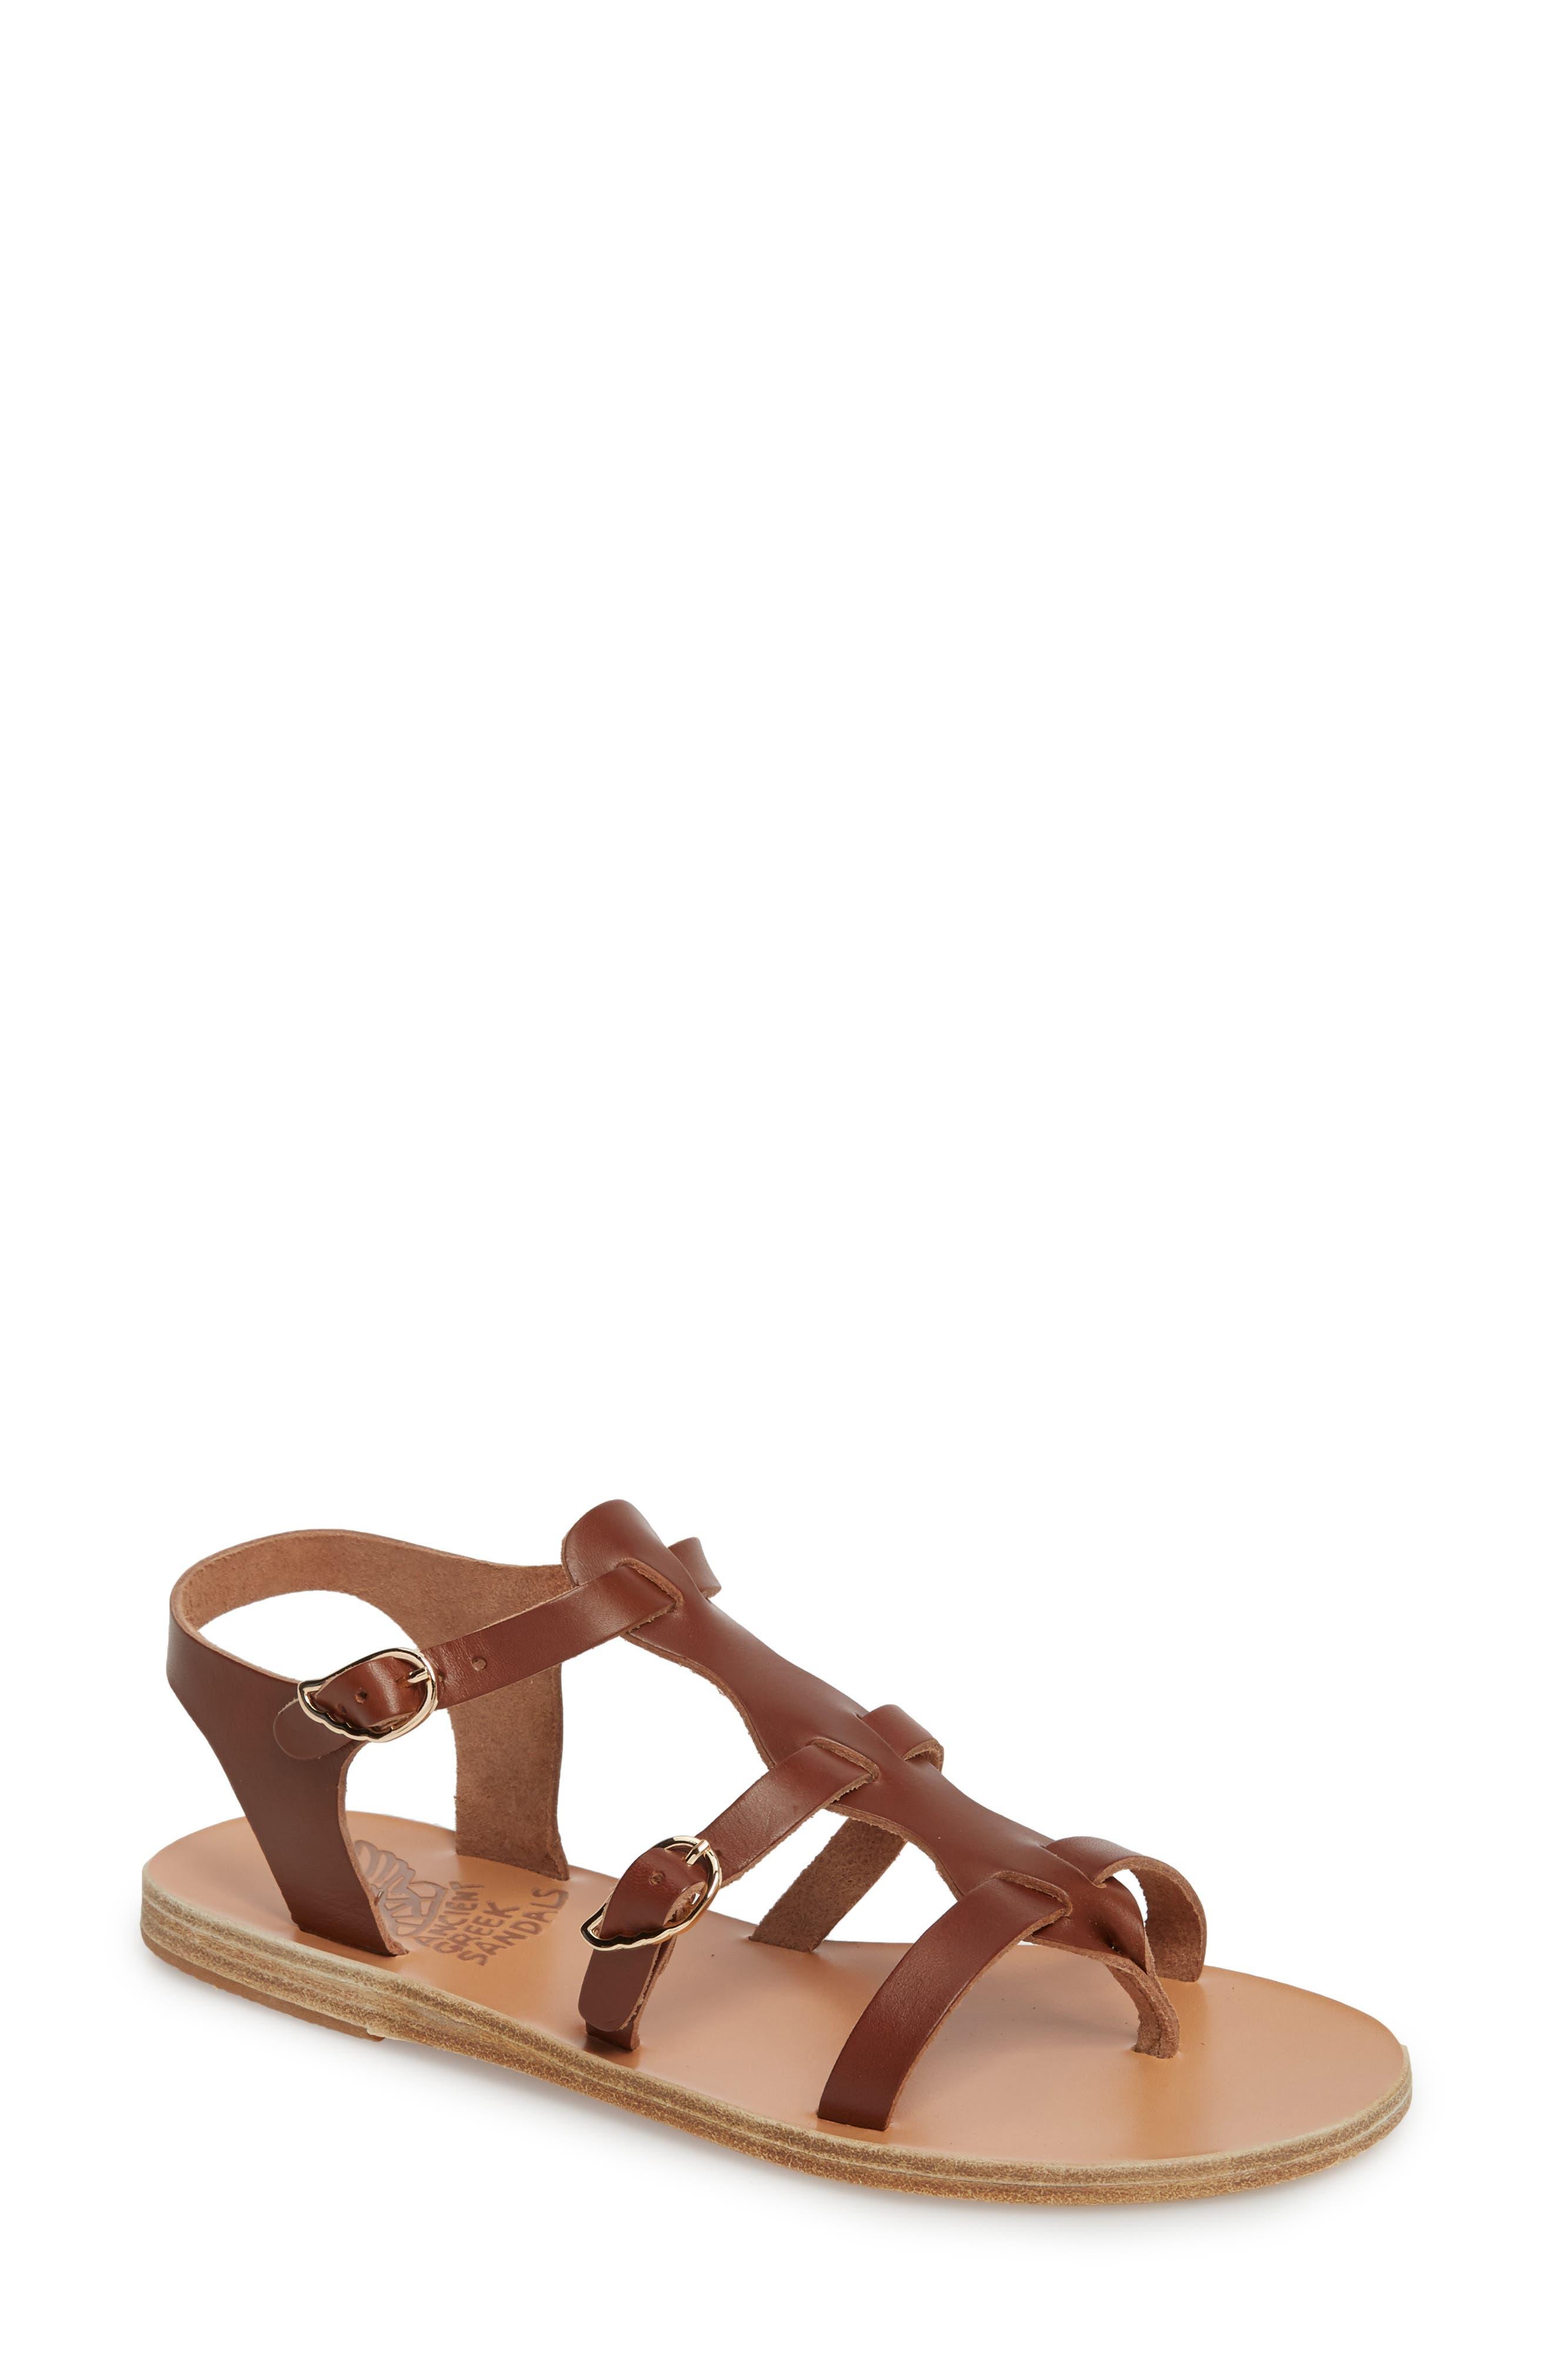 T-Strap Sandal,                         Main,                         color, Cotto